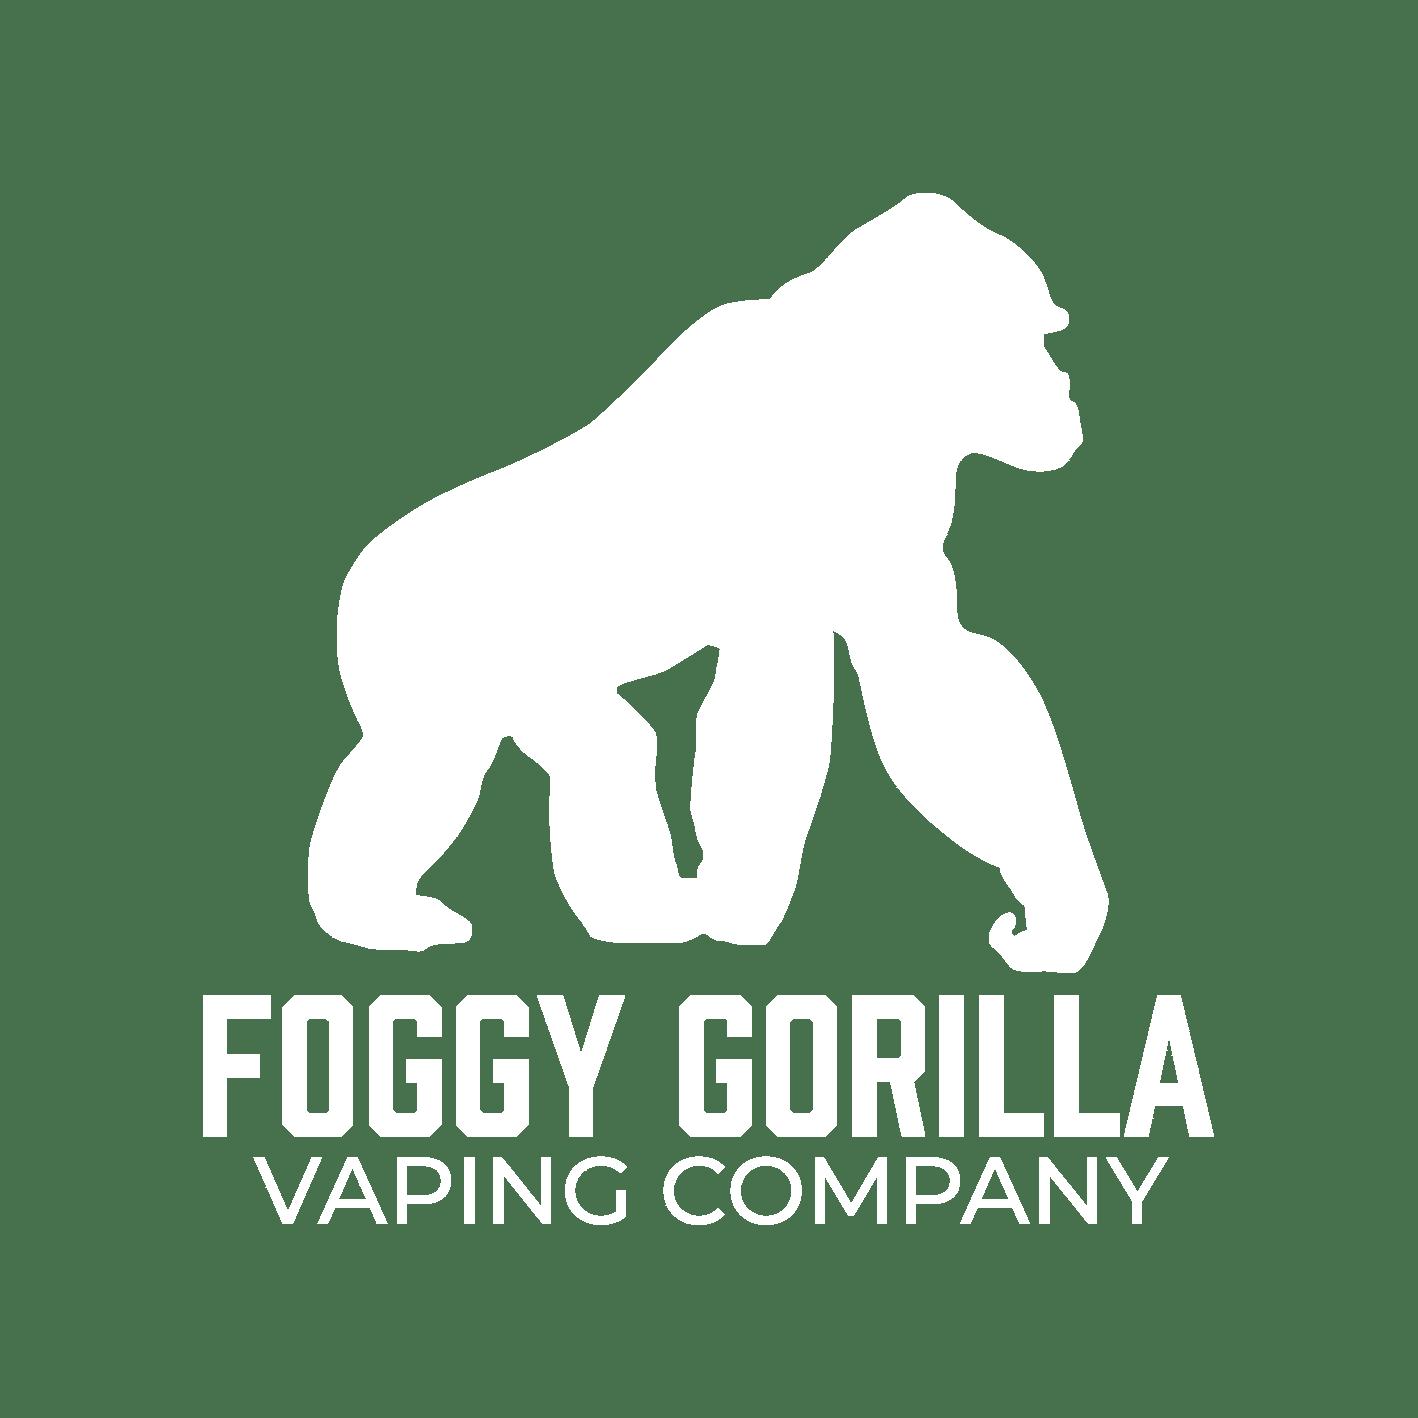 foggy gorilla logo